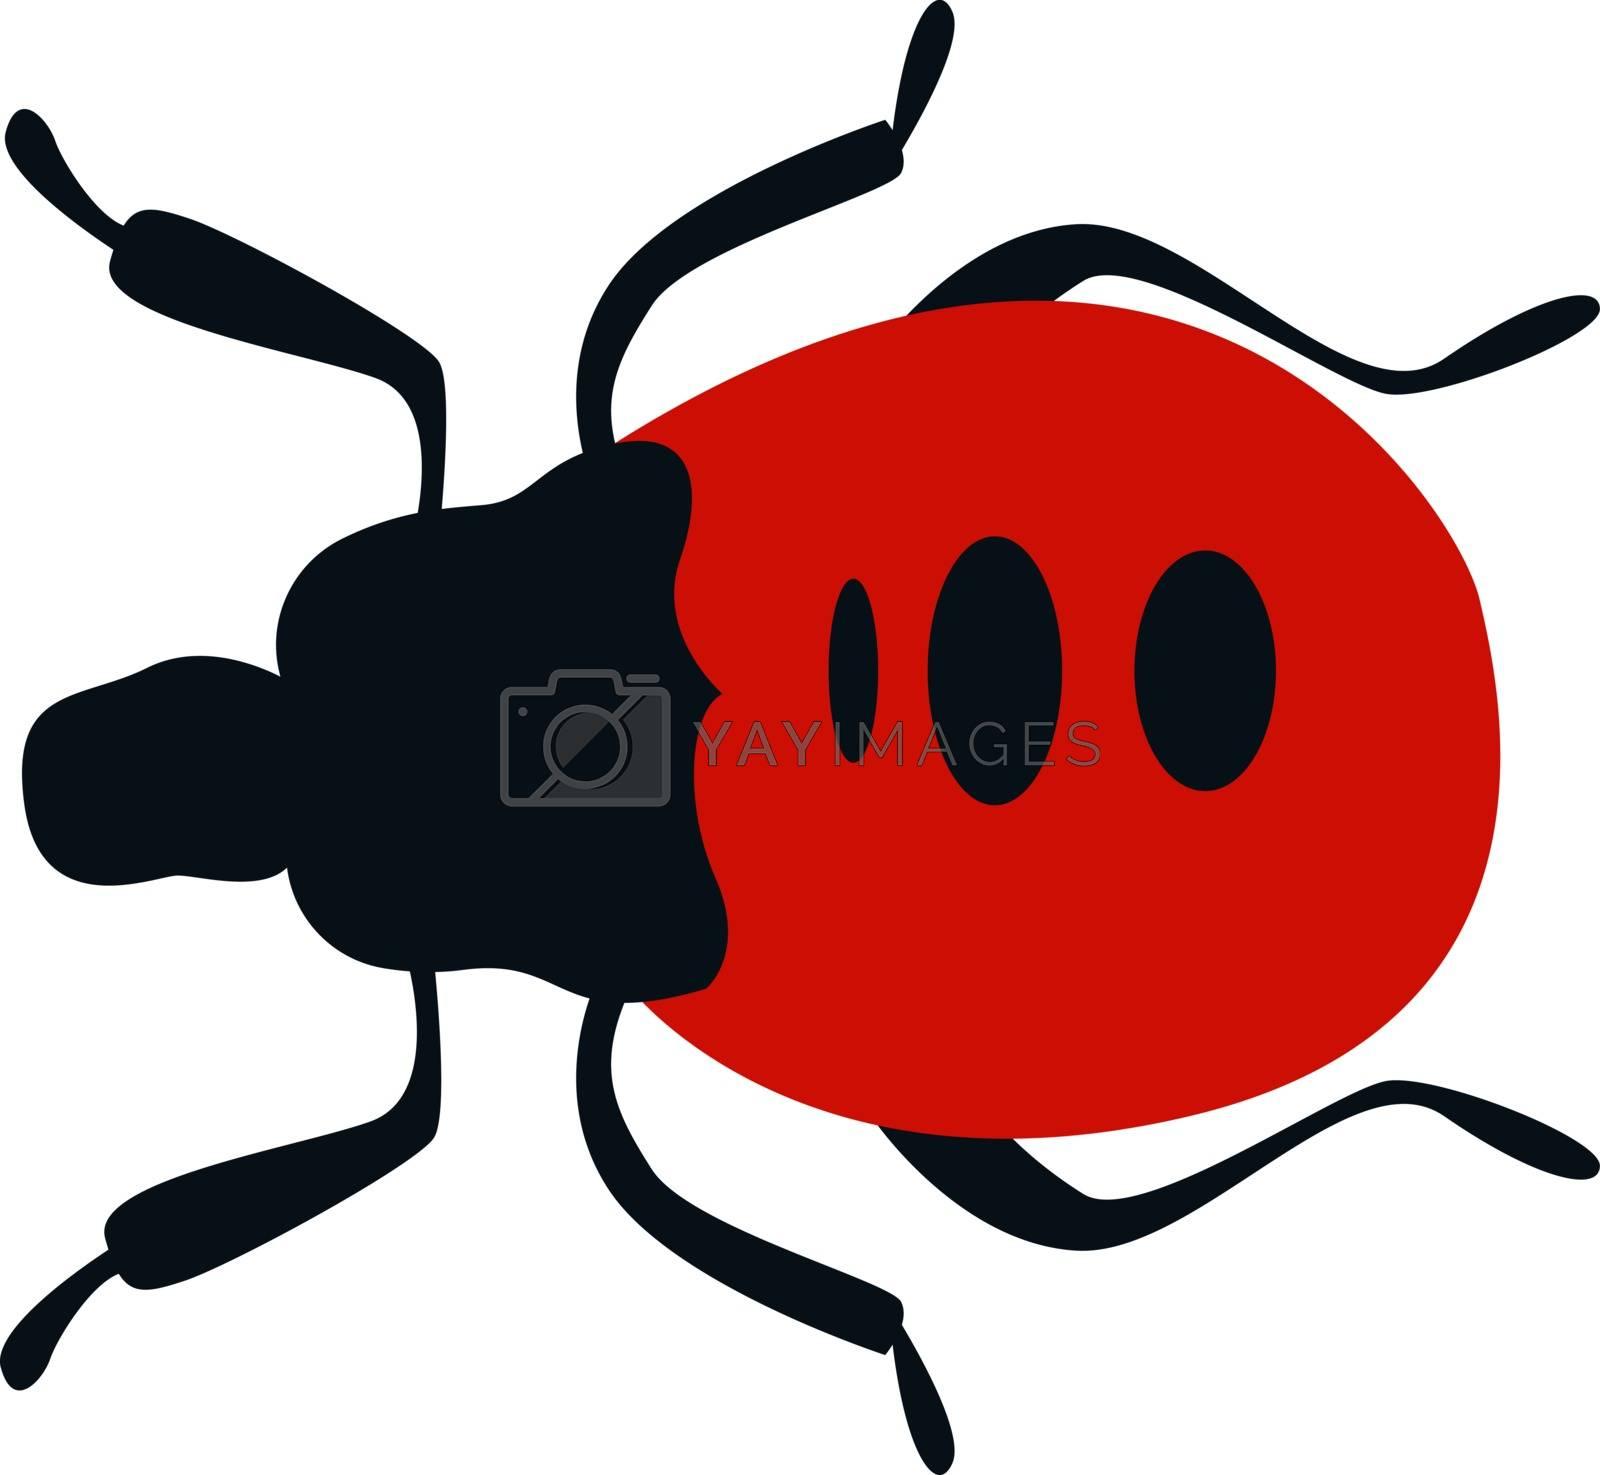 Stink bug, illustration, vector on white background.